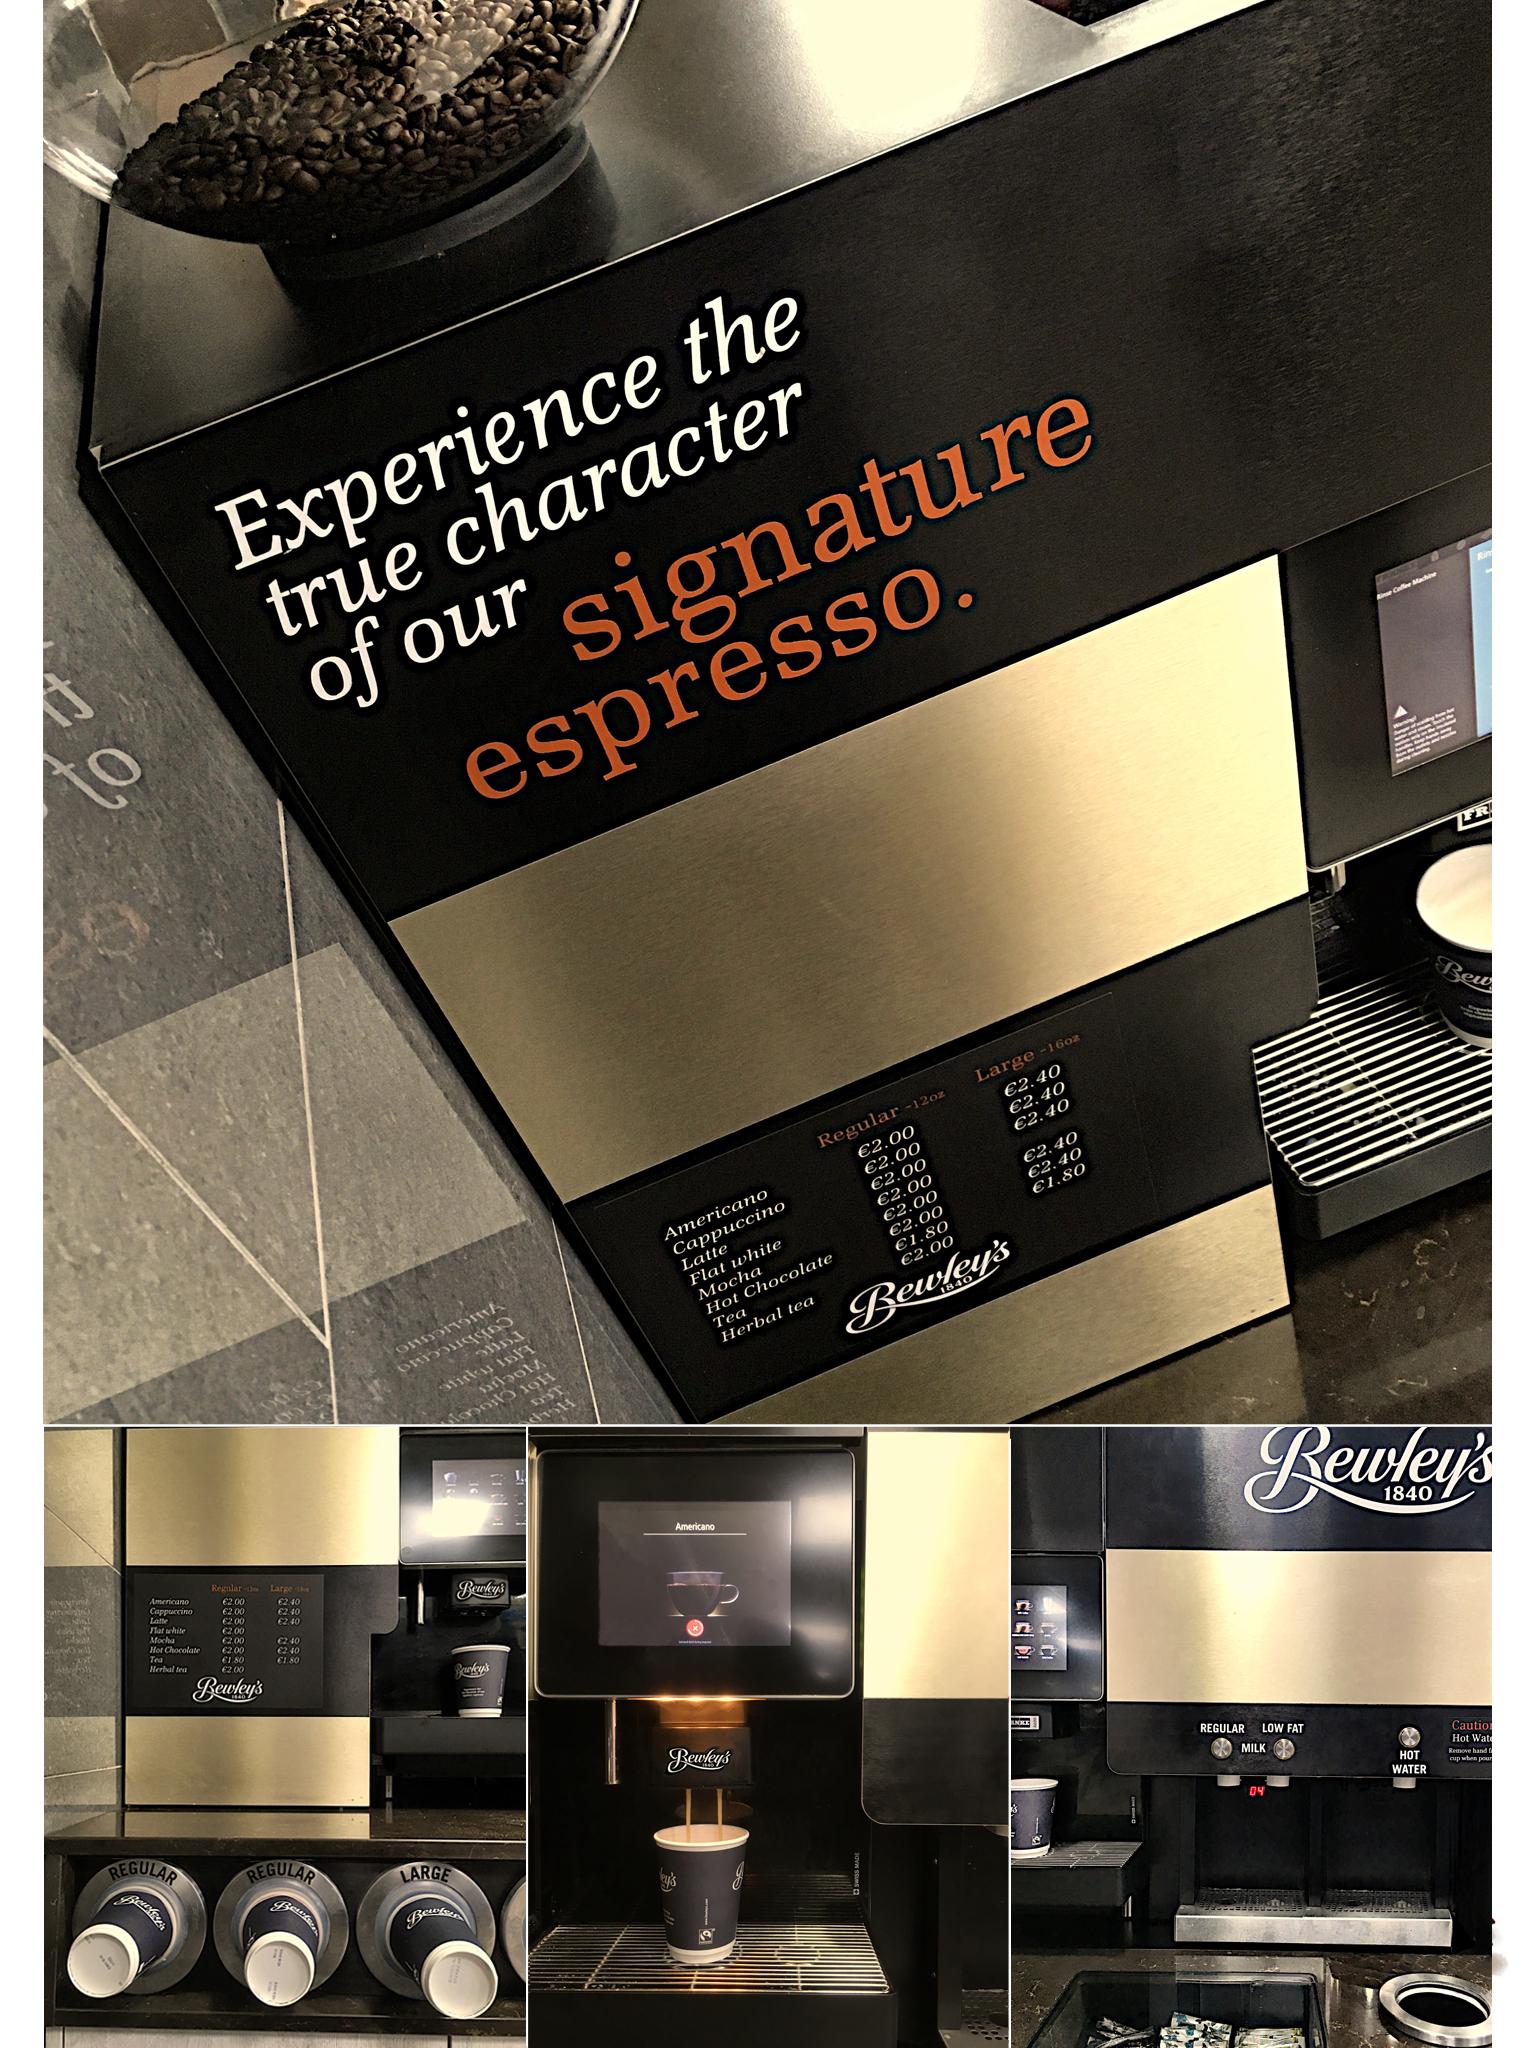 bewrley coffe machine.jpg